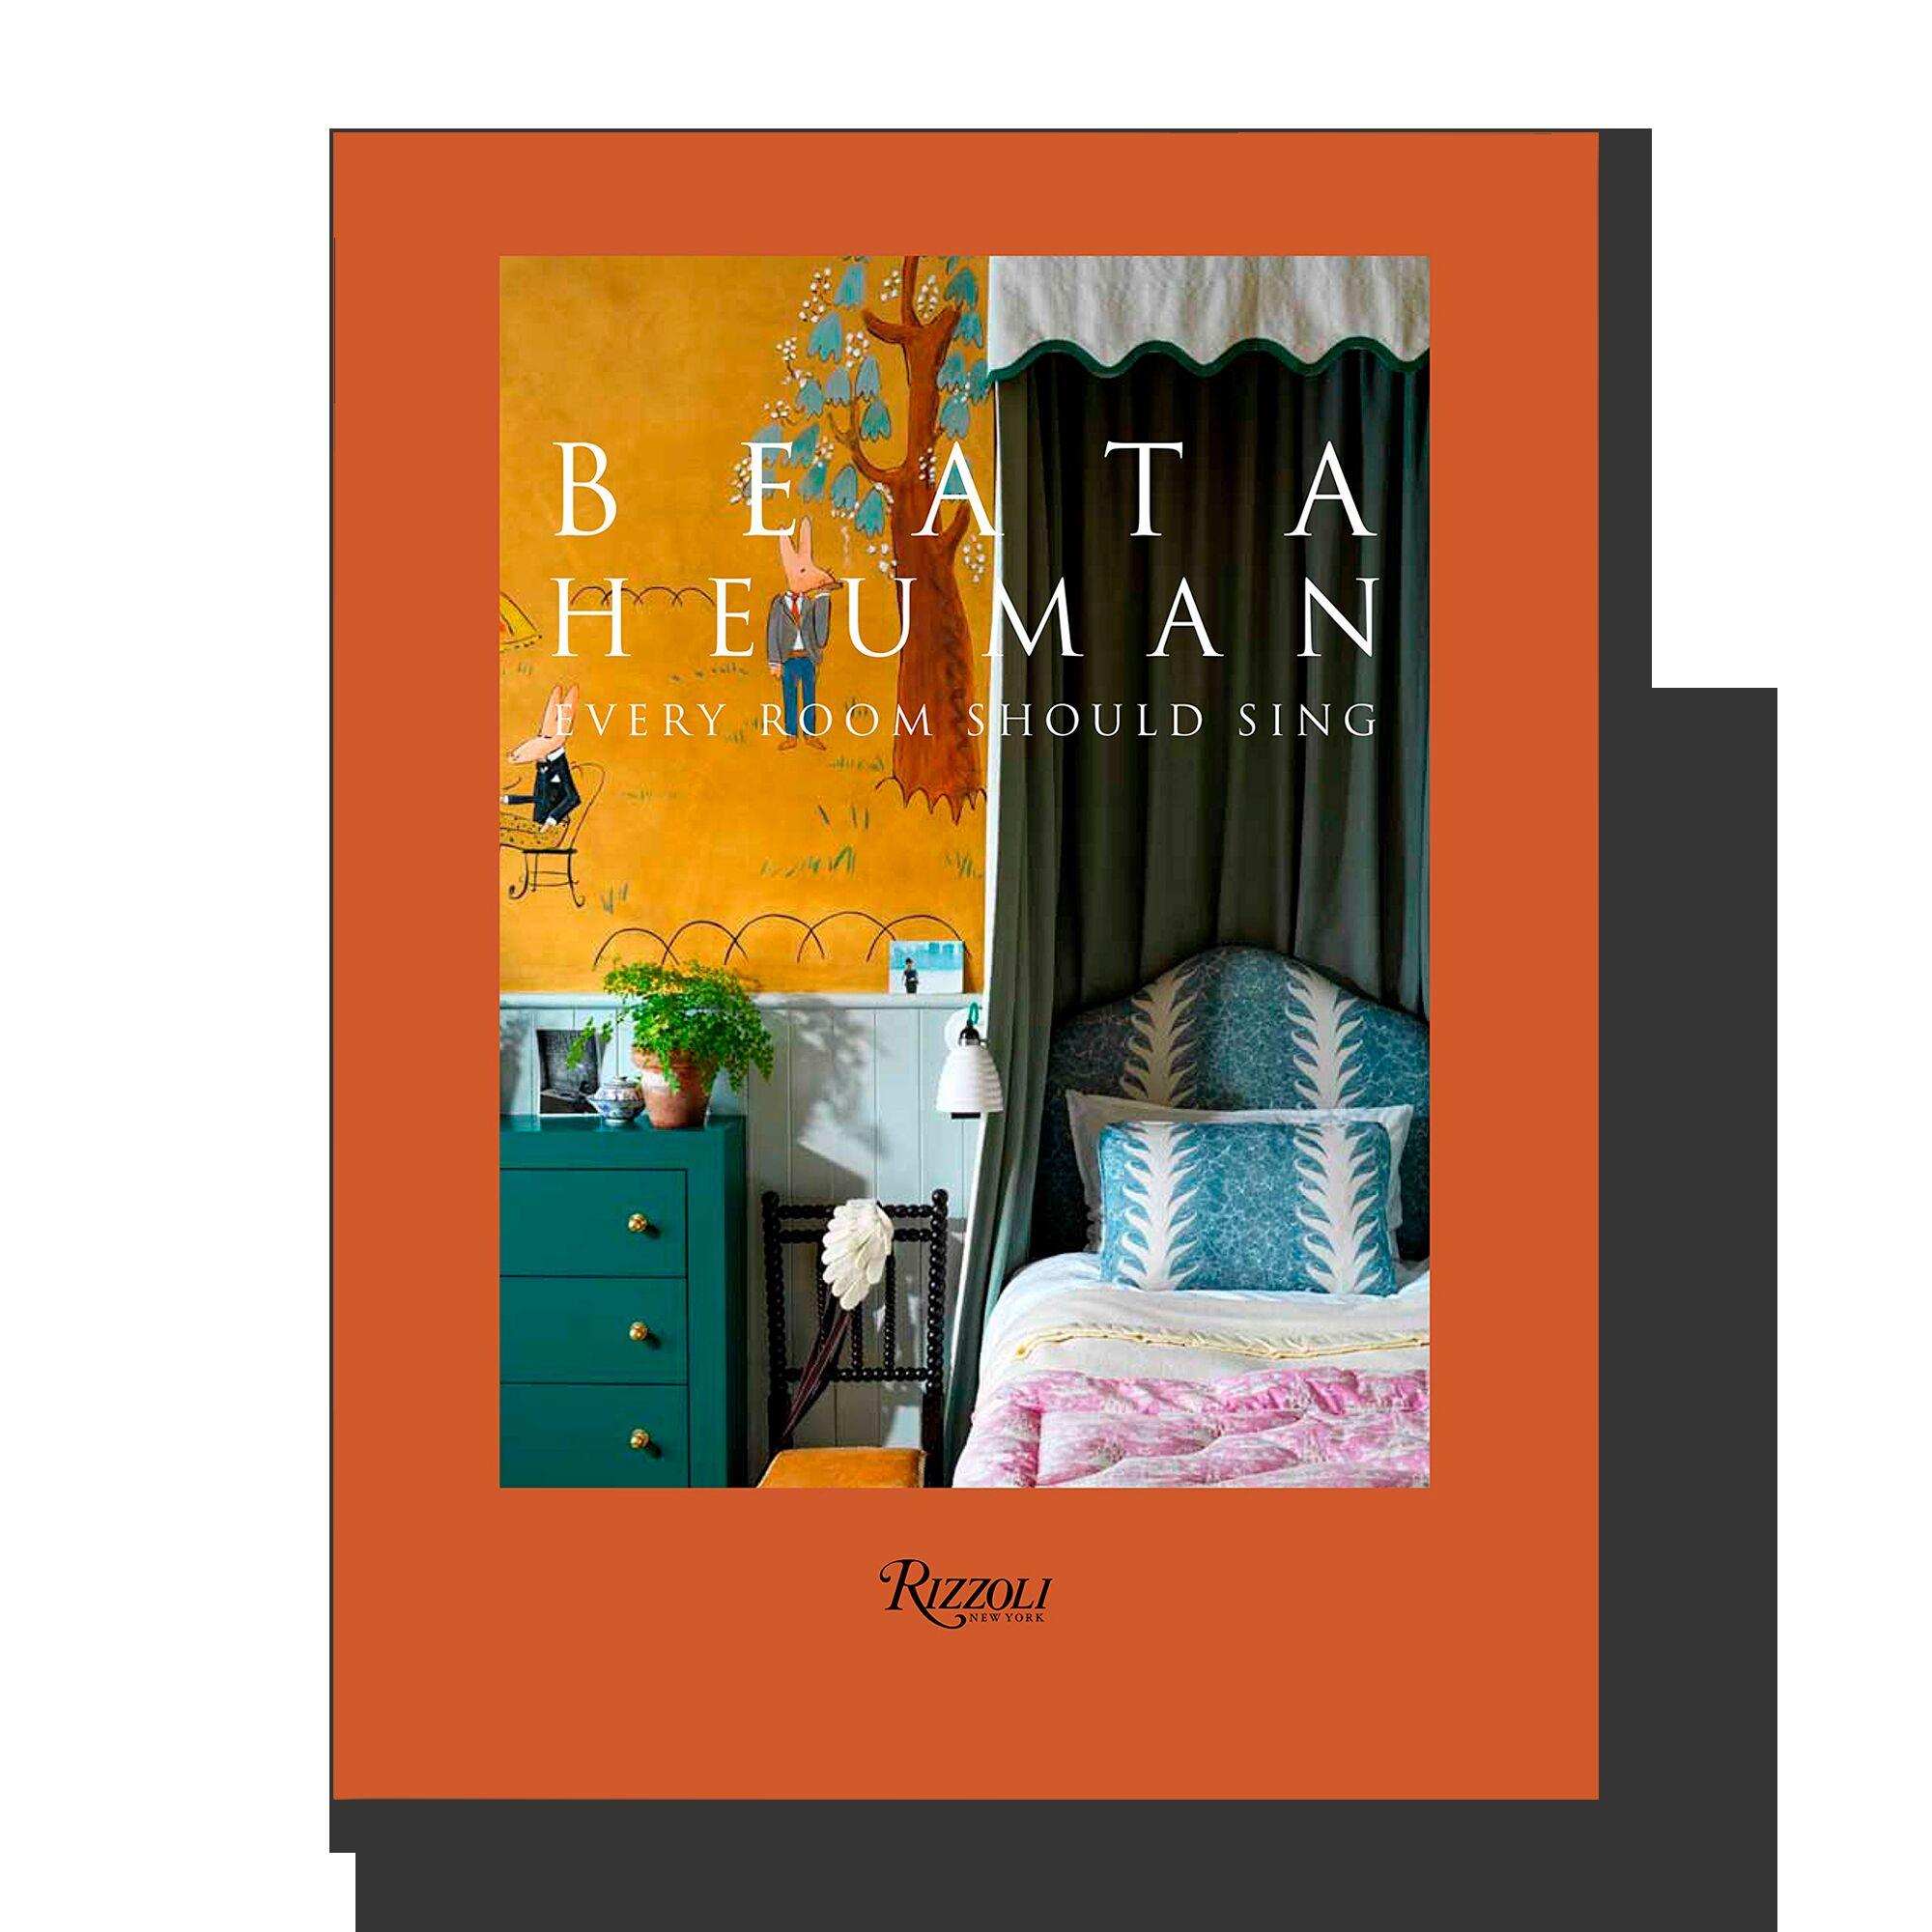 Beata Heuman: Every Room Should Sing